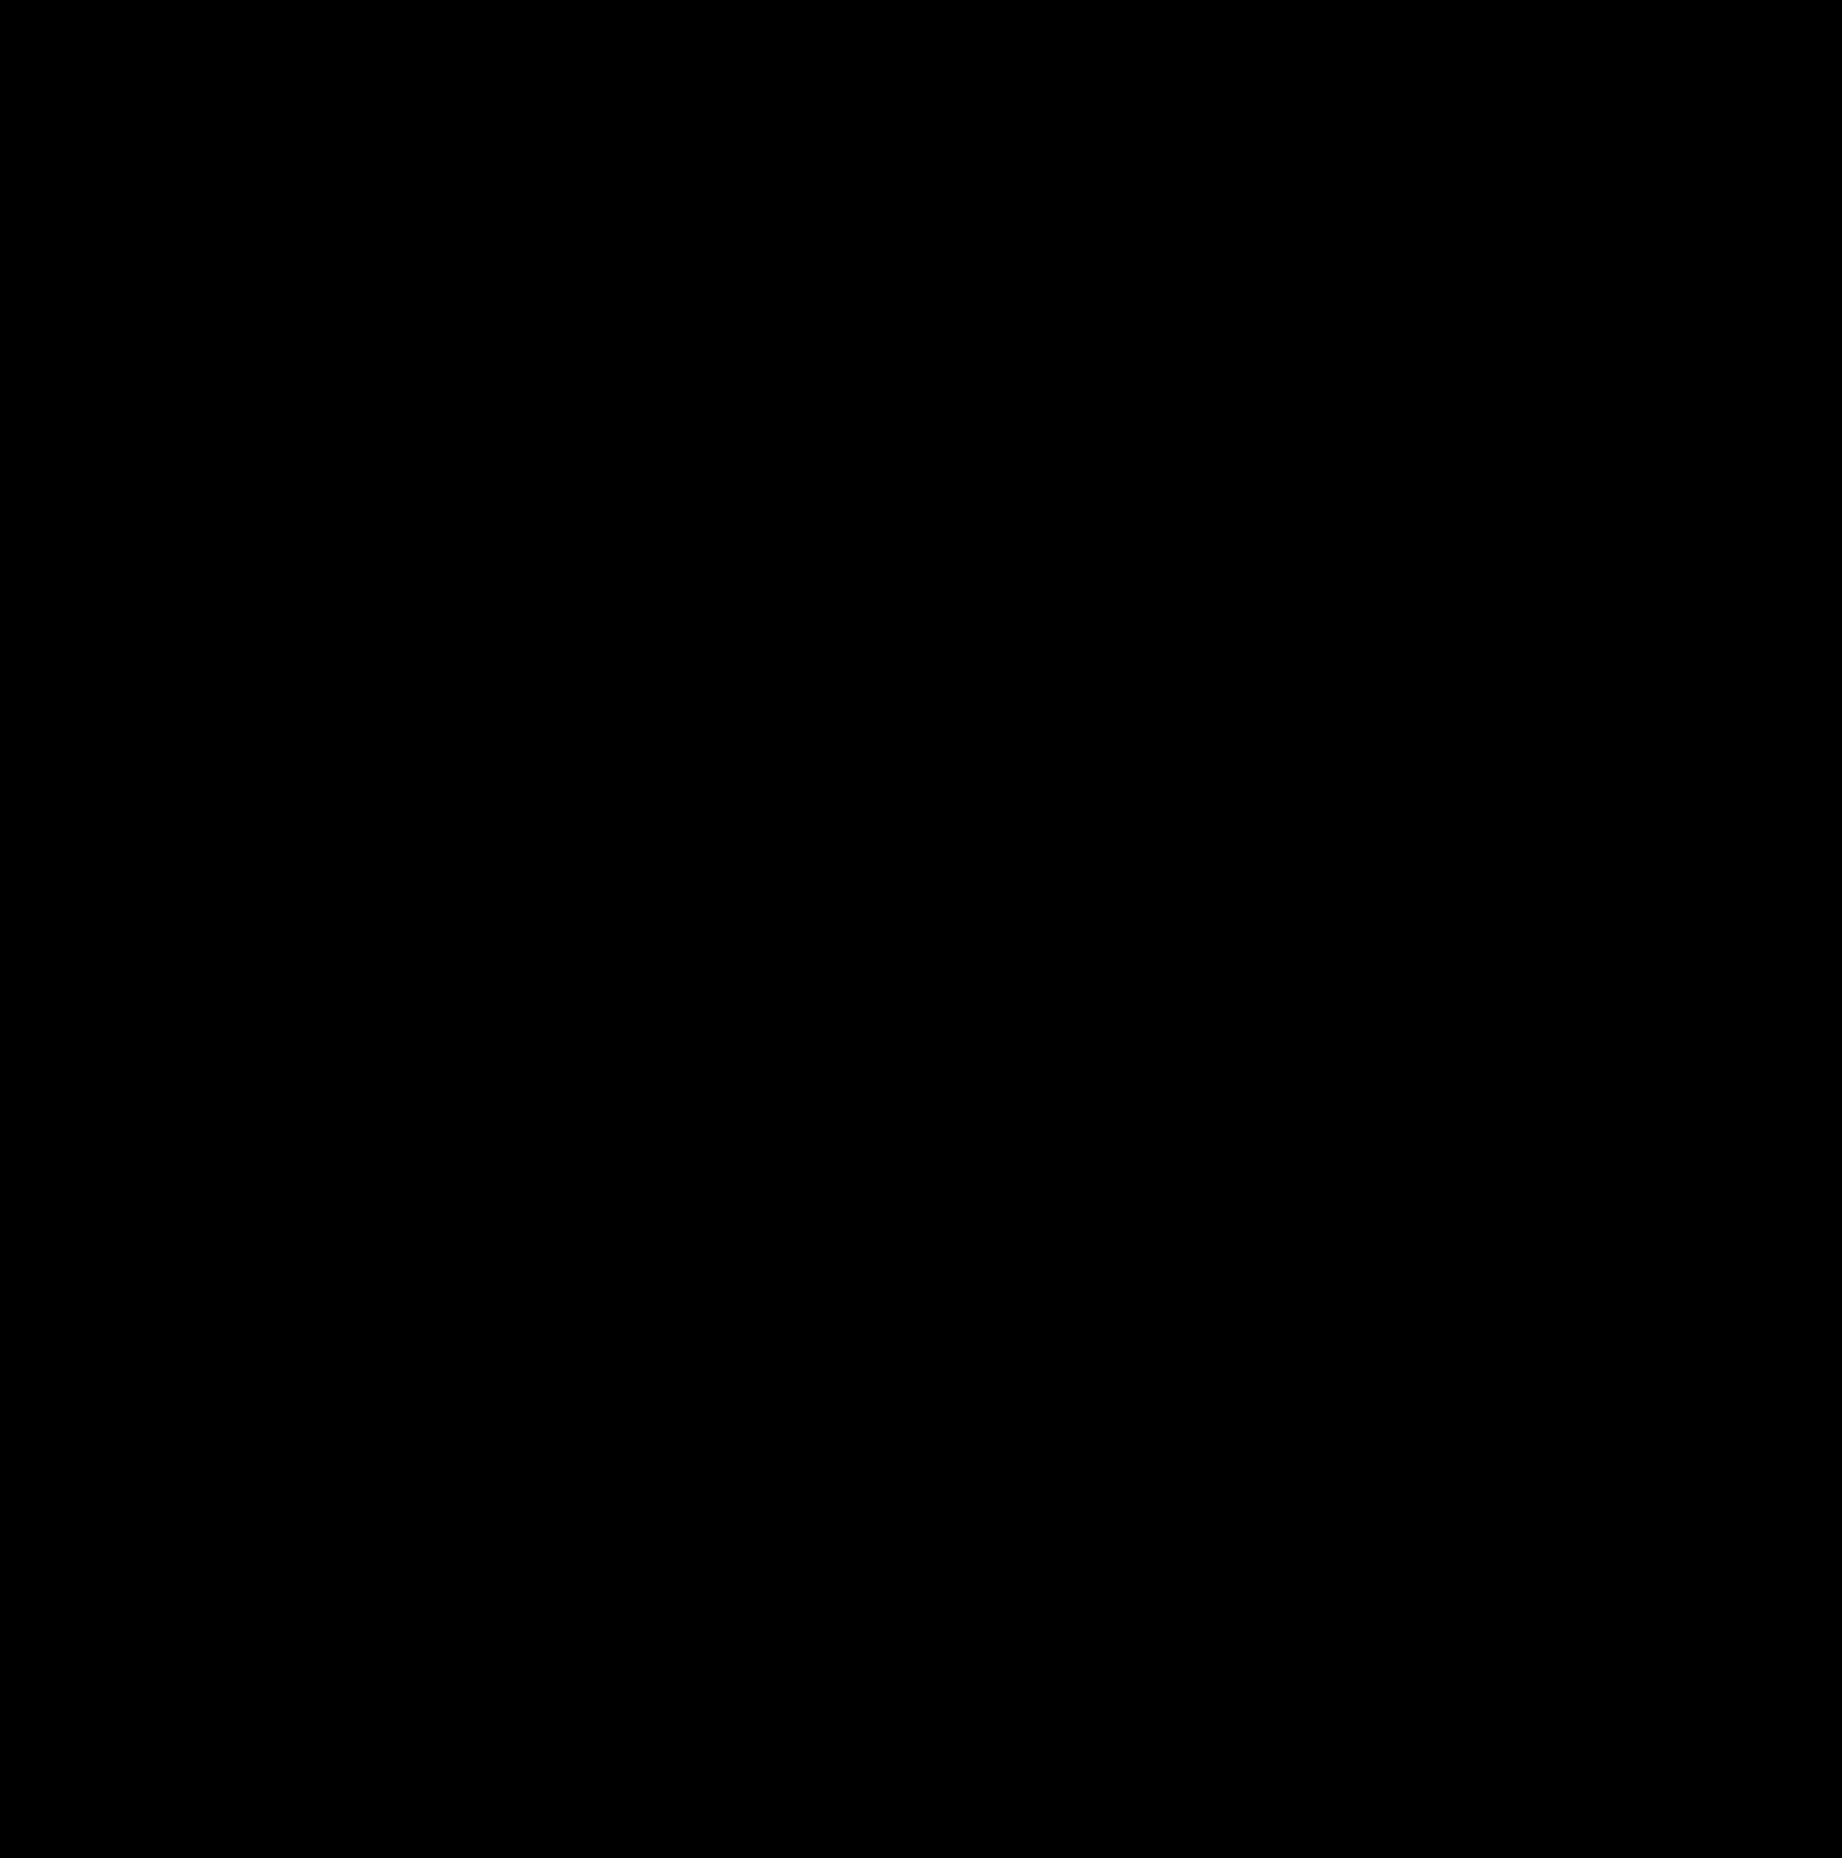 5x Magazin AK47 30Schuss Polymer